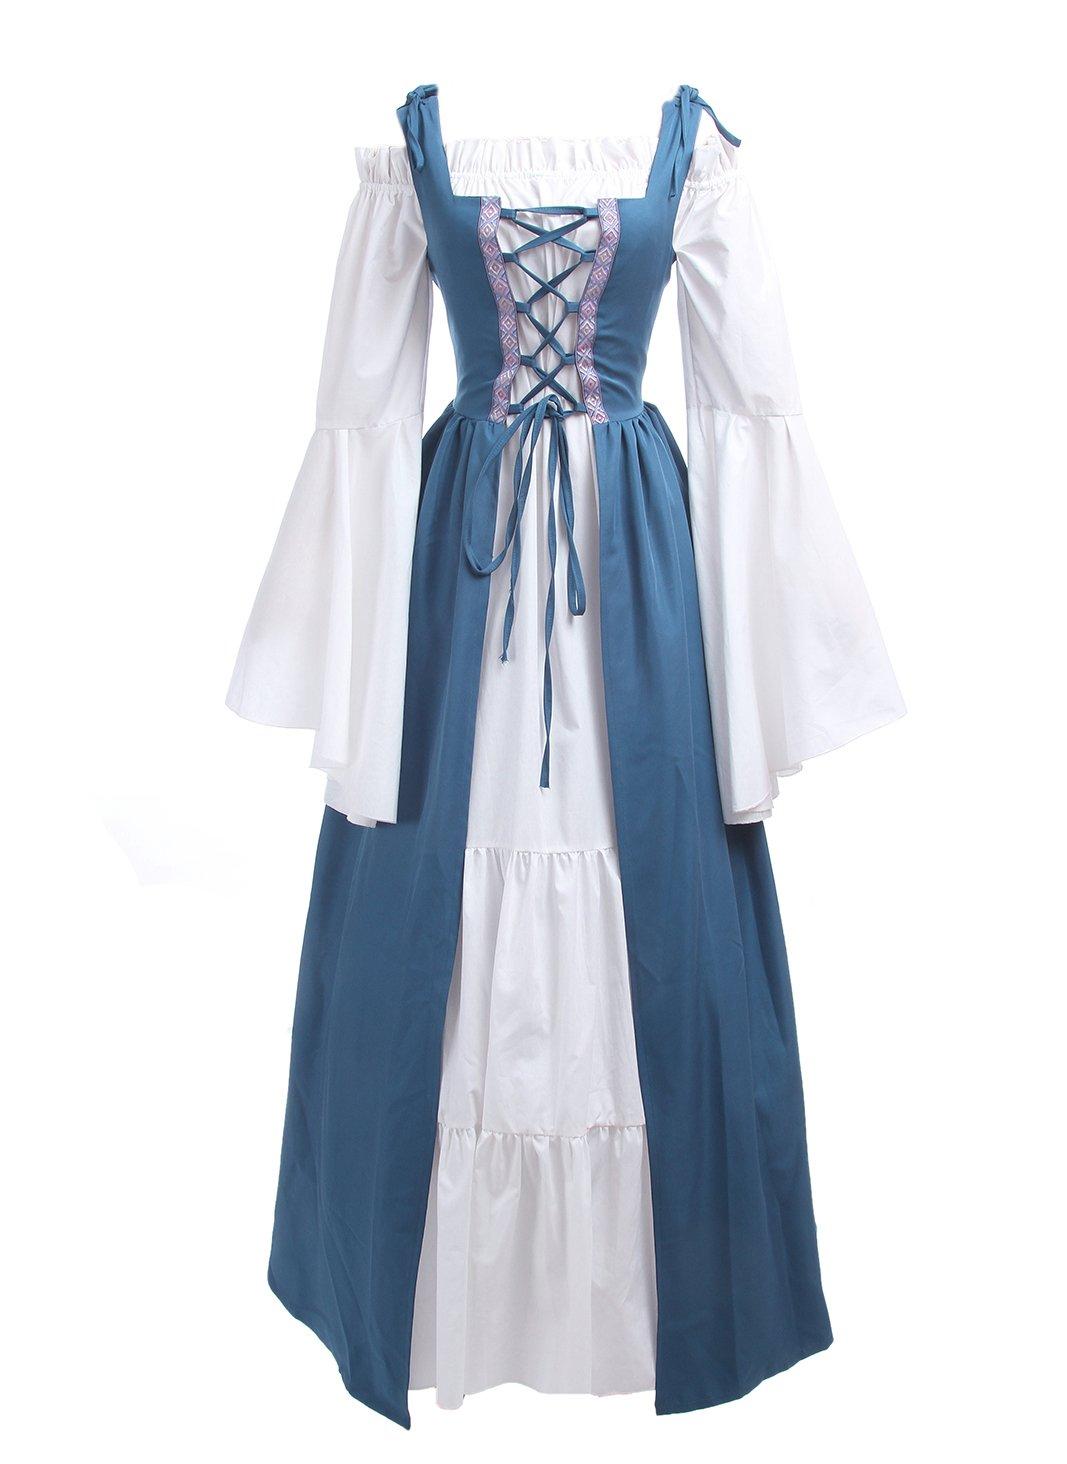 ROLECOS Womens Renaissance Medieval Irish Costume Boho Underdress Overdress Coat Light Blue L by ROLECOS (Image #2)